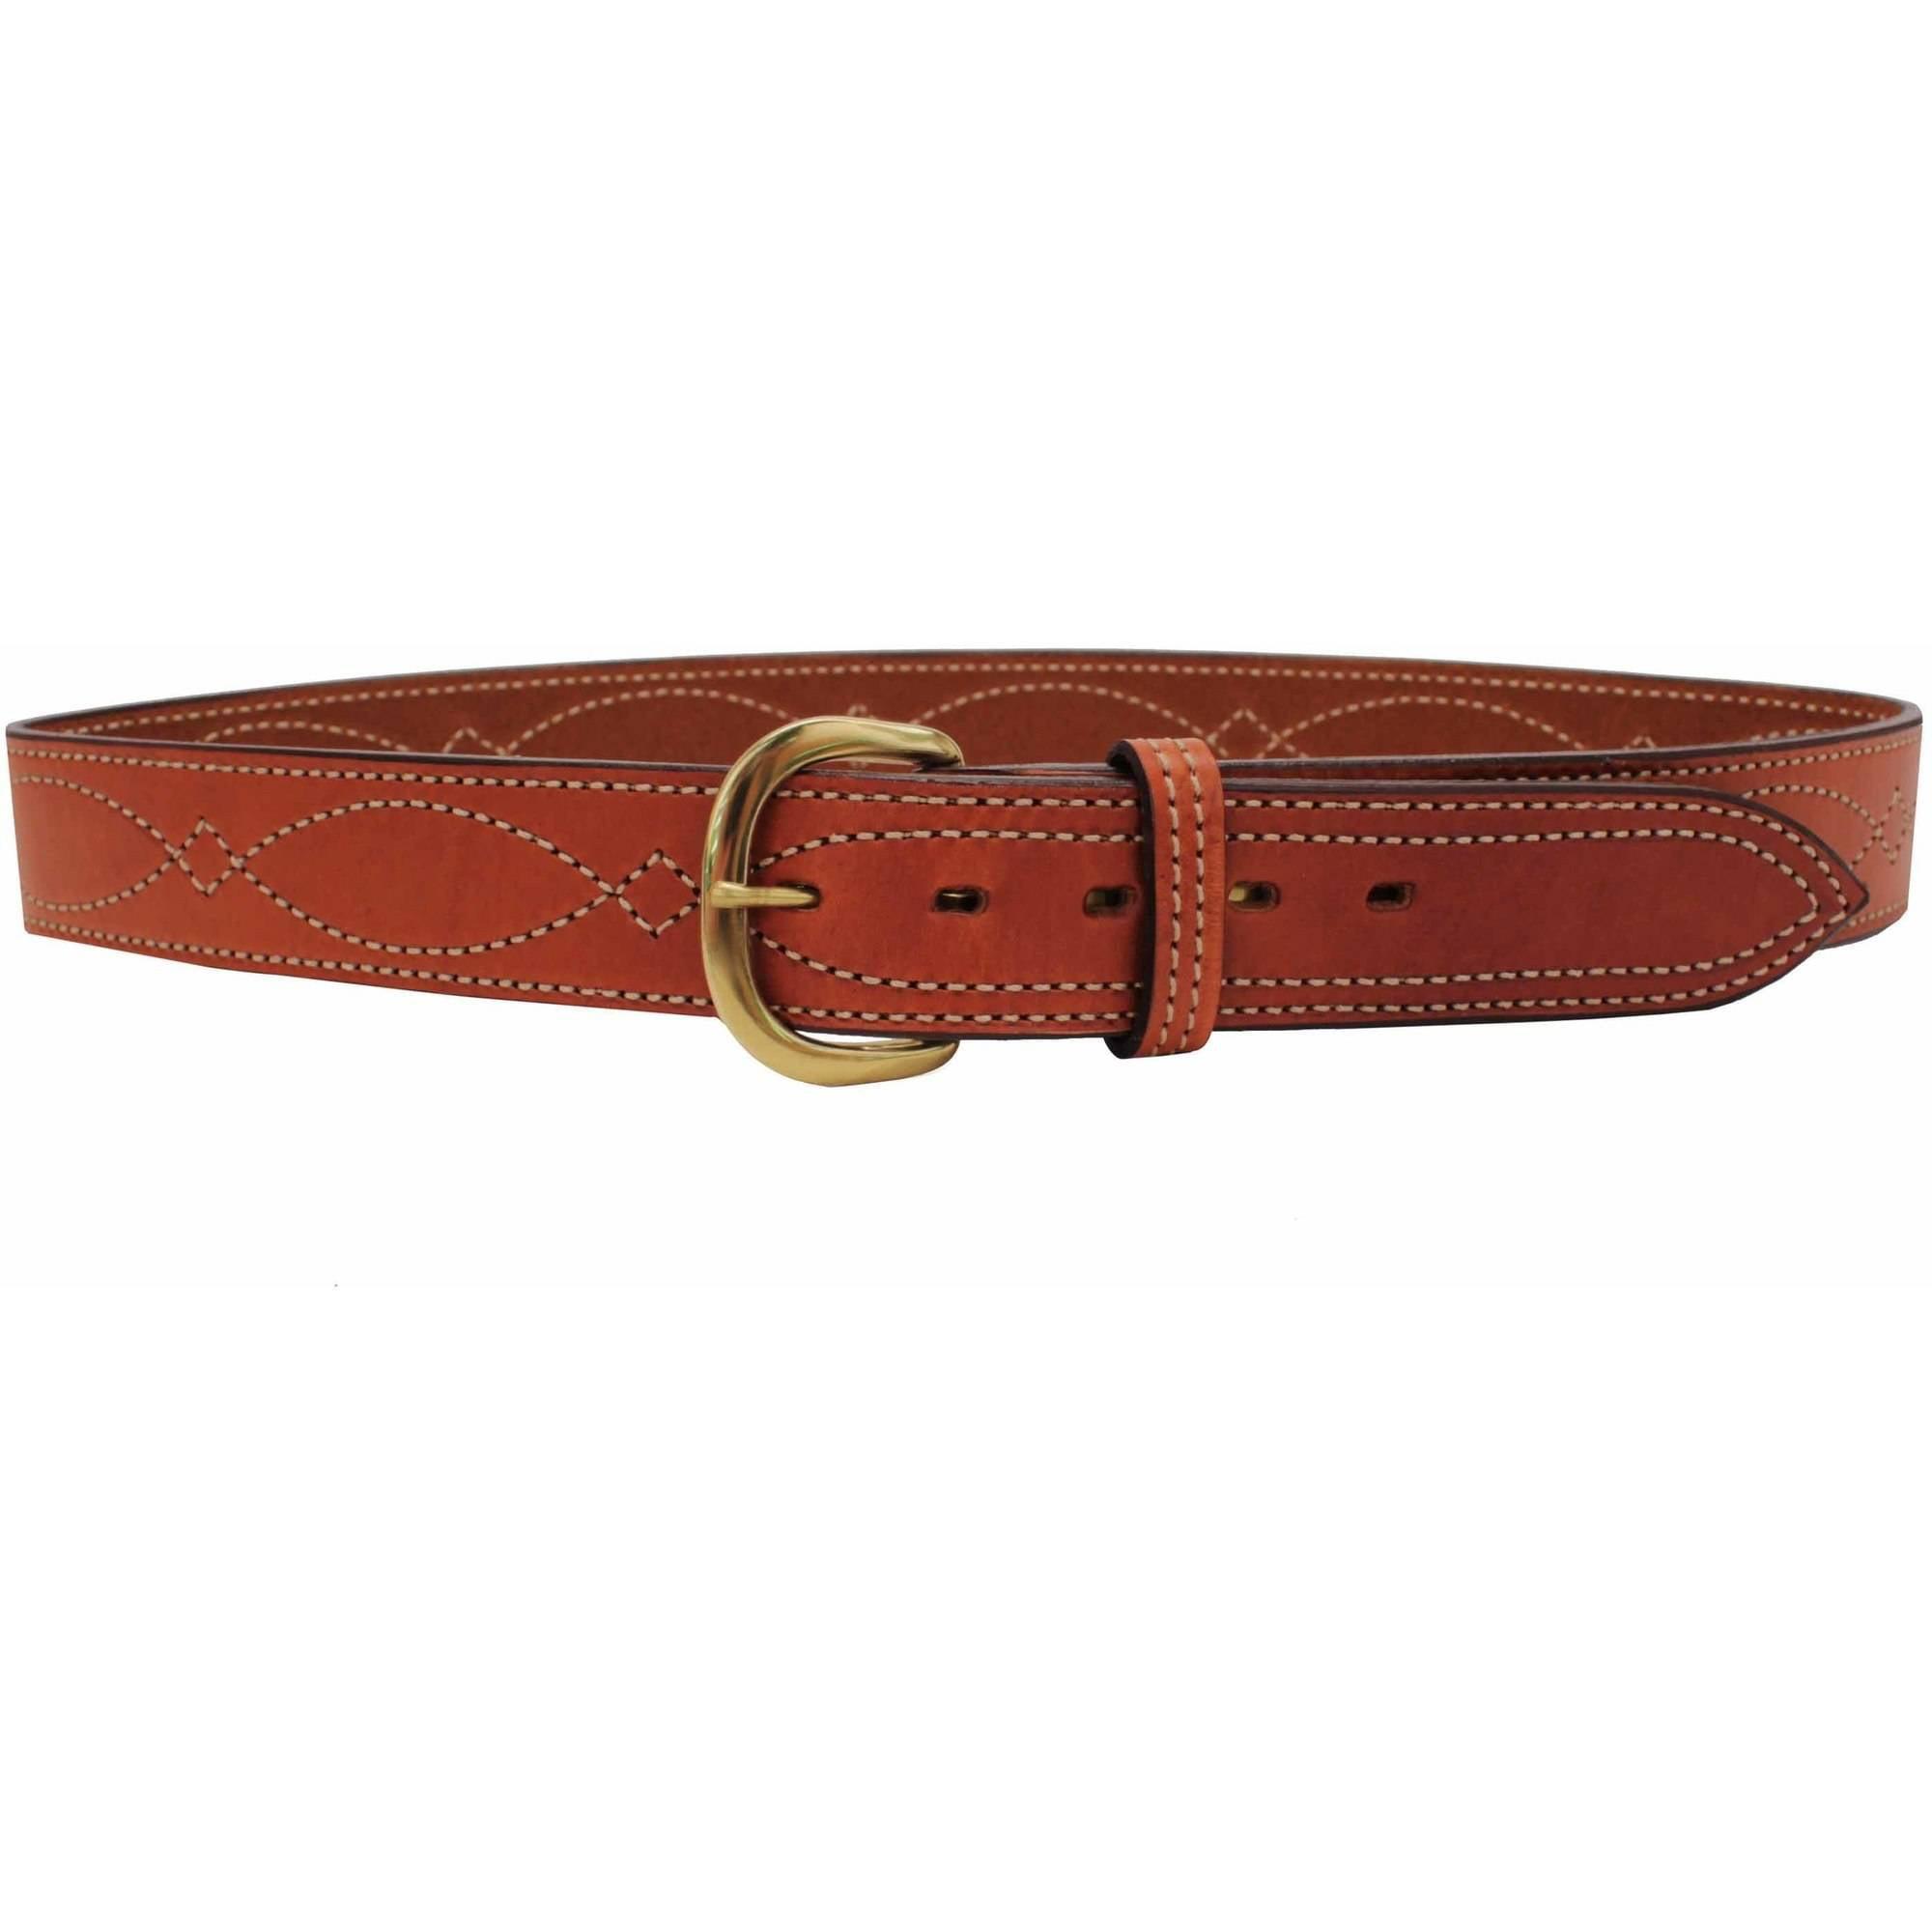 Bianchi B9 Fancy Stitched Belt by Bianchi